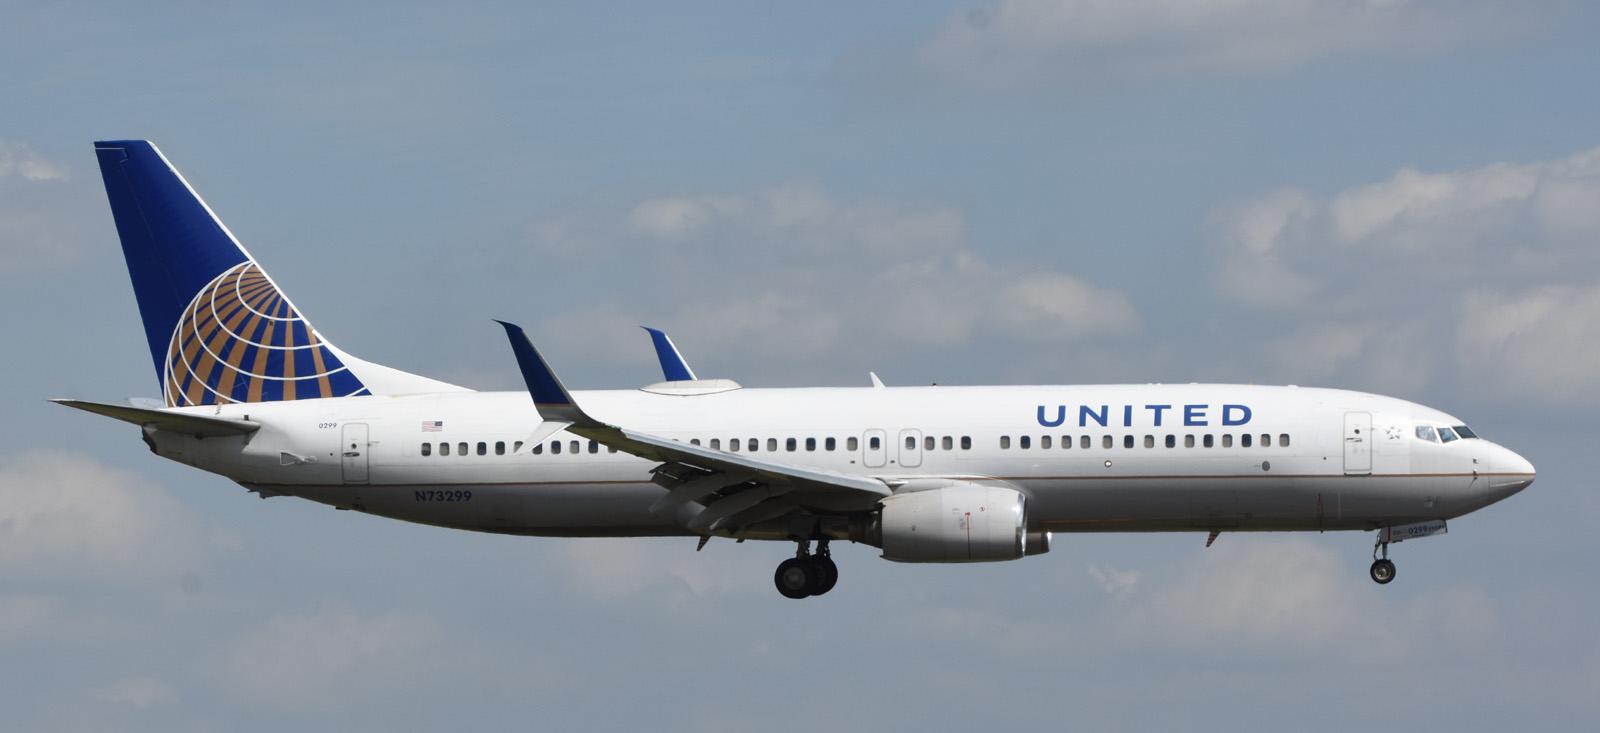 United170919g720